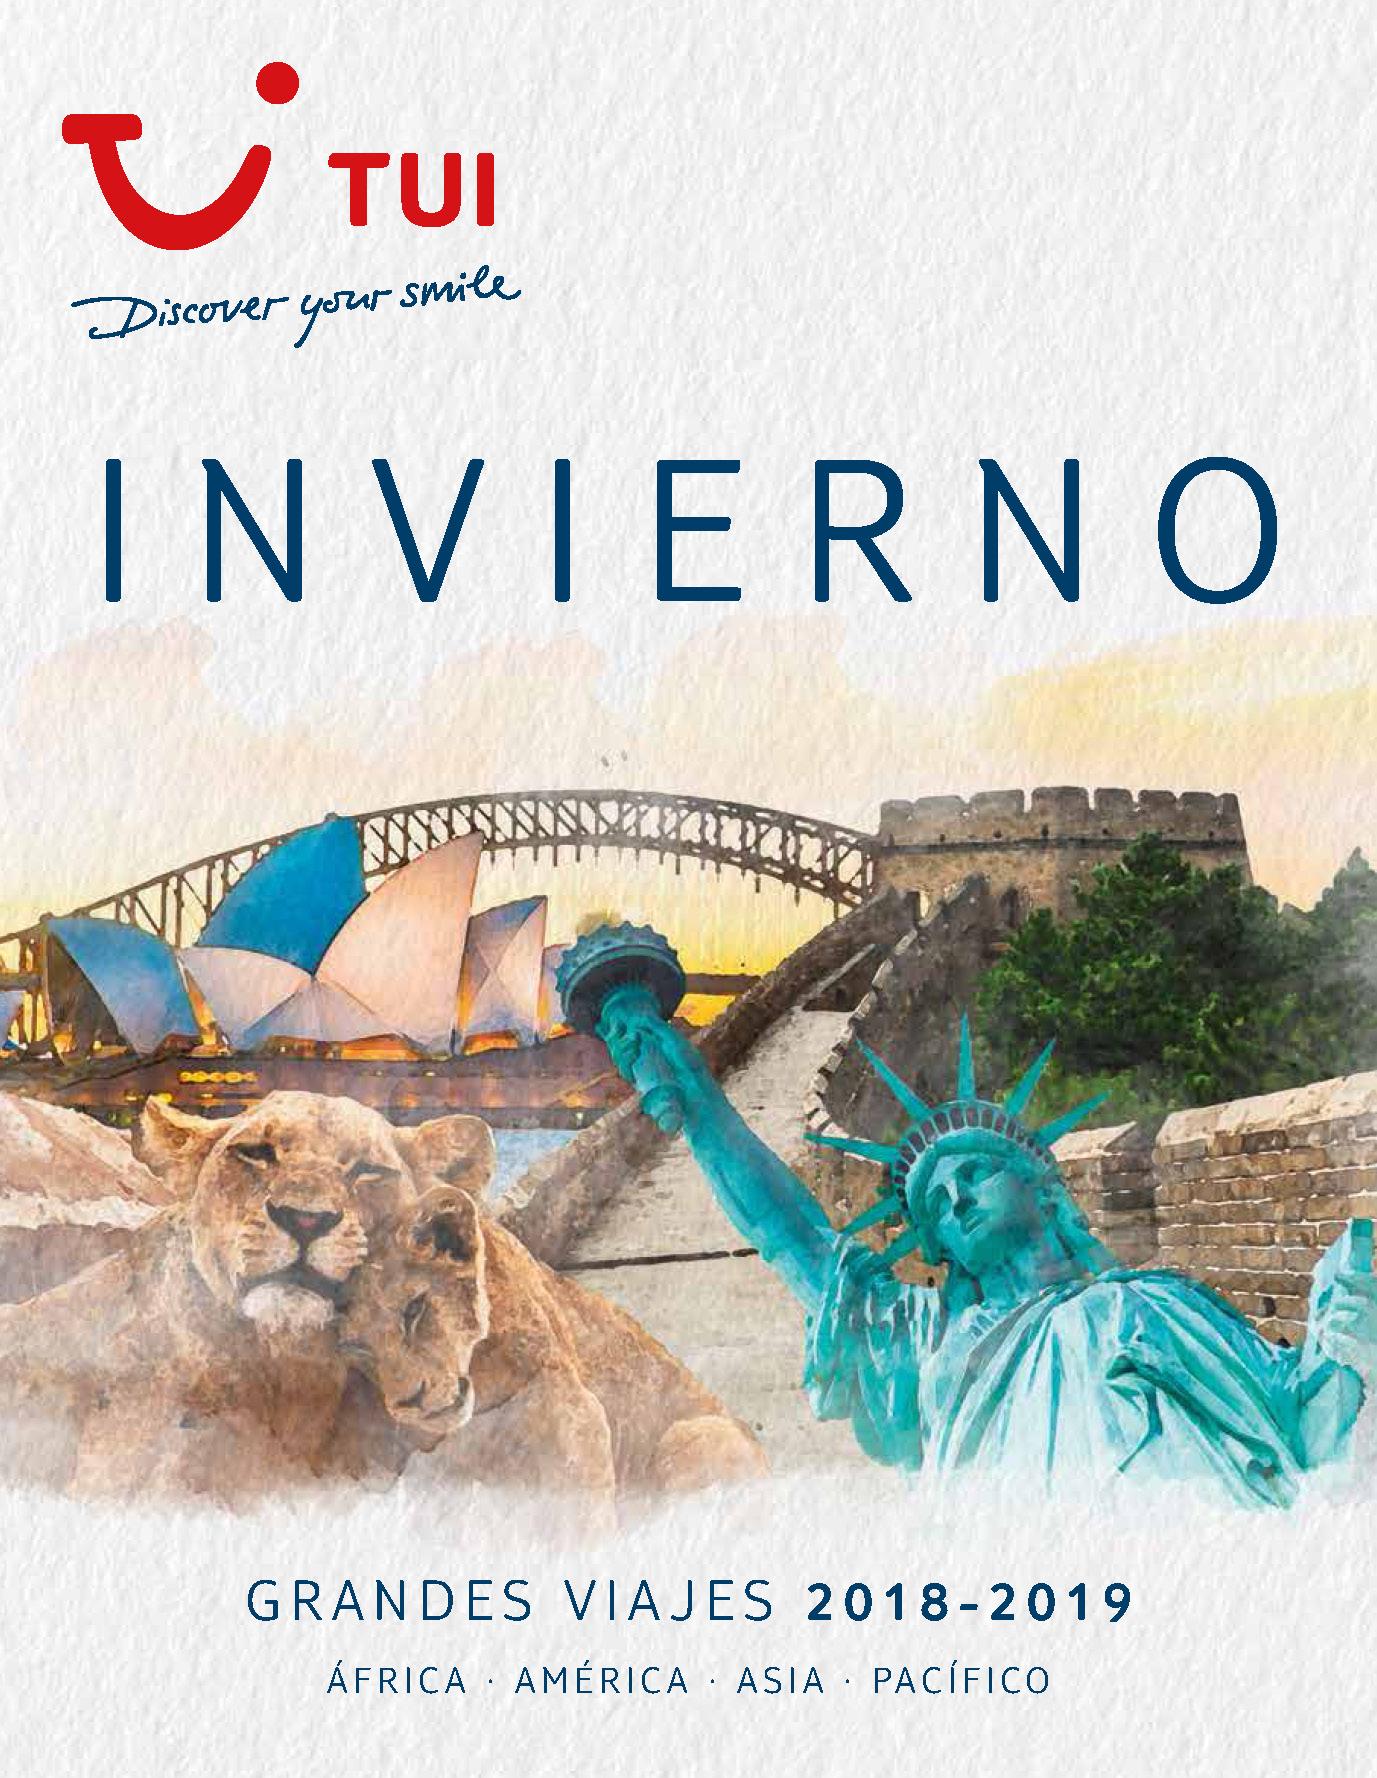 Catalogo TUI Ambassador Tours Grandes Viajes Invierno 2018-2019